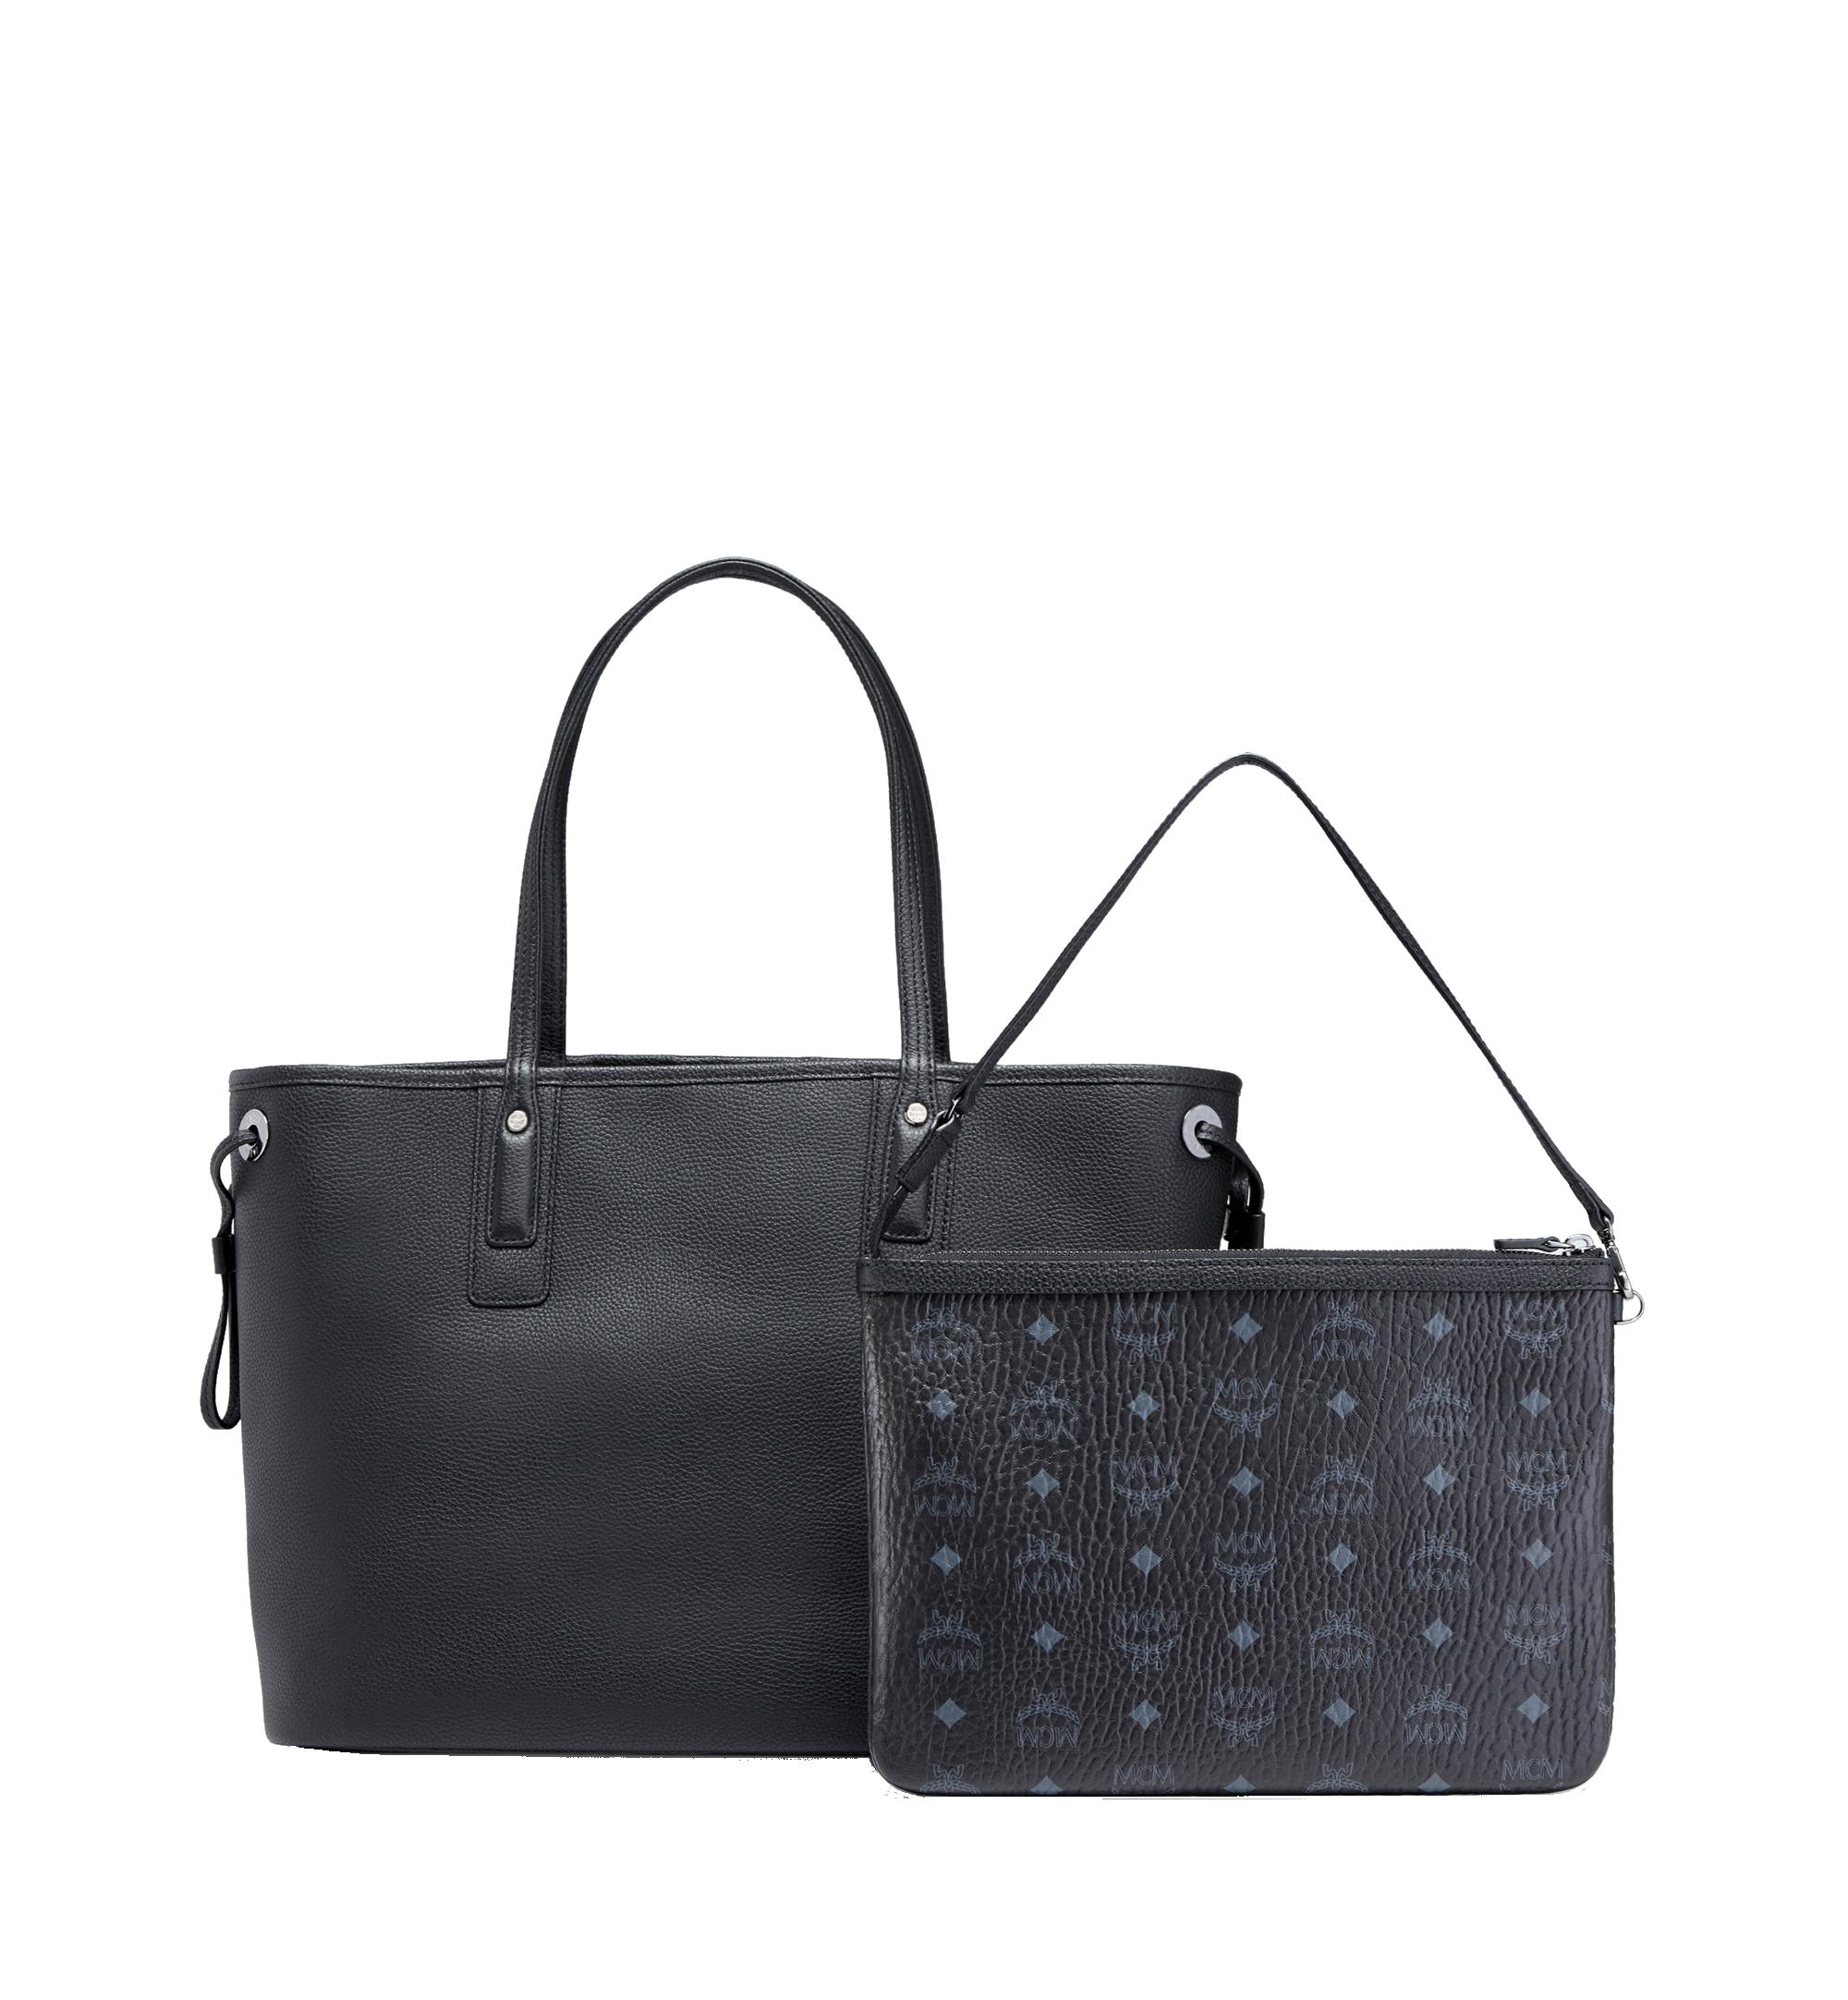 Medium Reversible Liz Shopper in Leather Black | MCM® DE